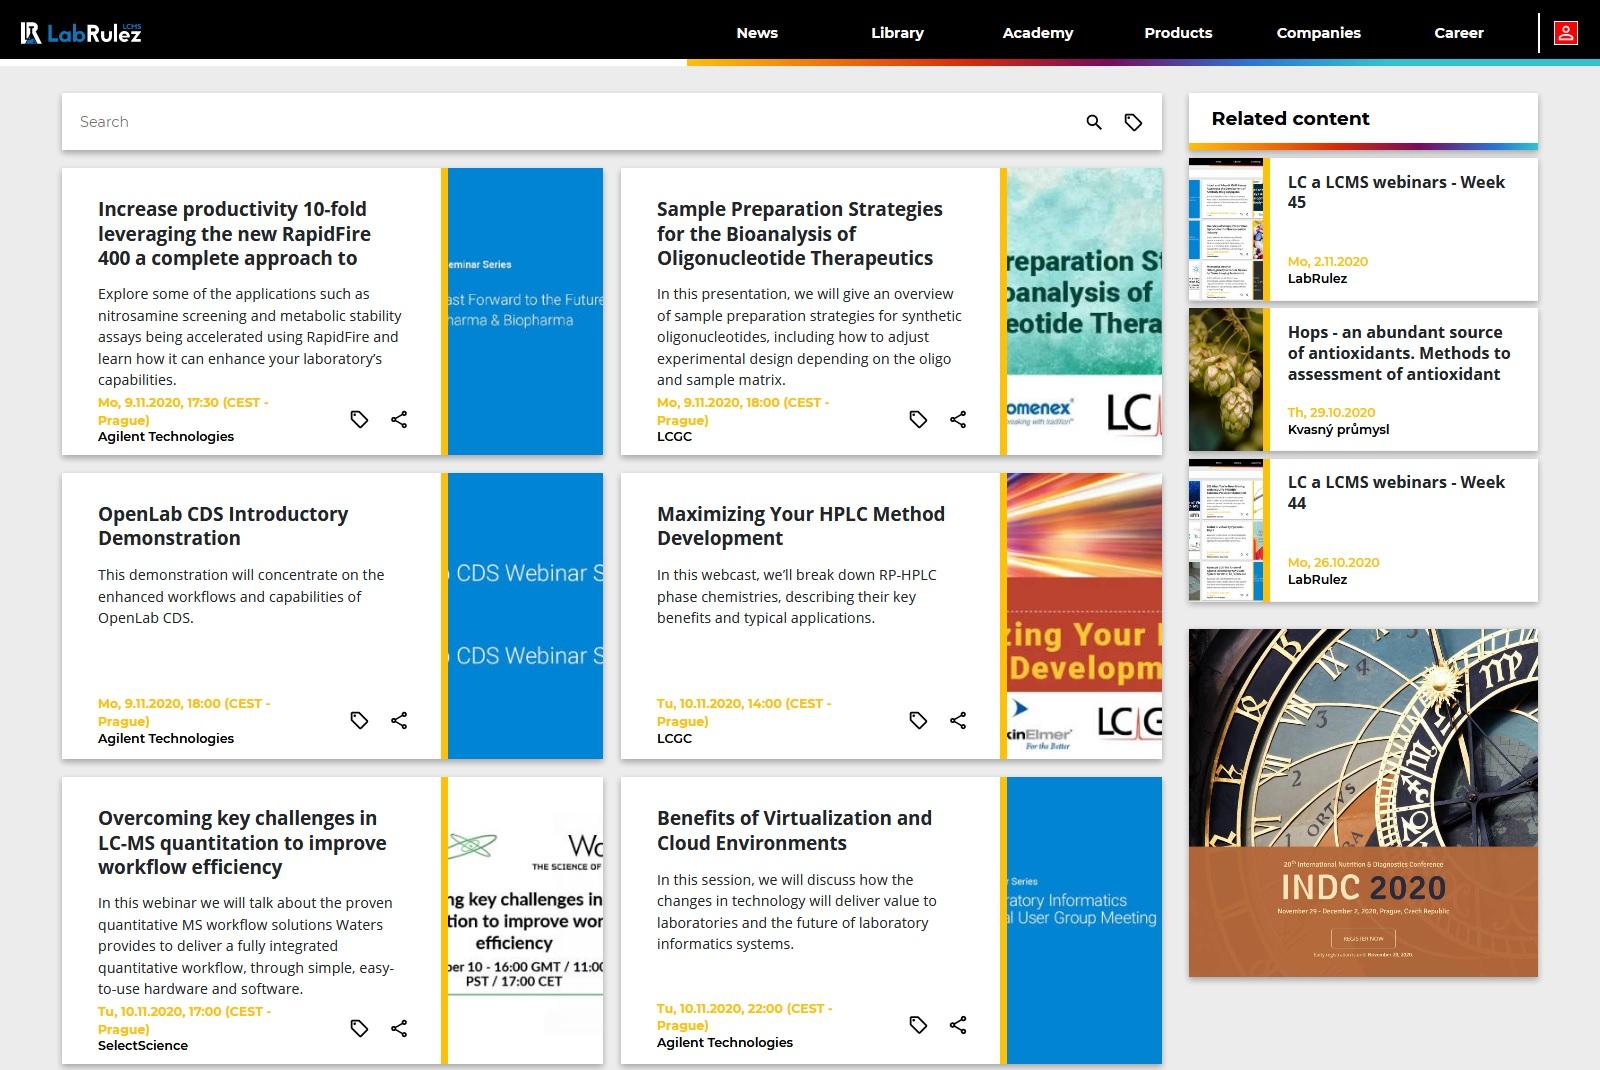 LabRulez: LC and LCMS webinars - Week 46